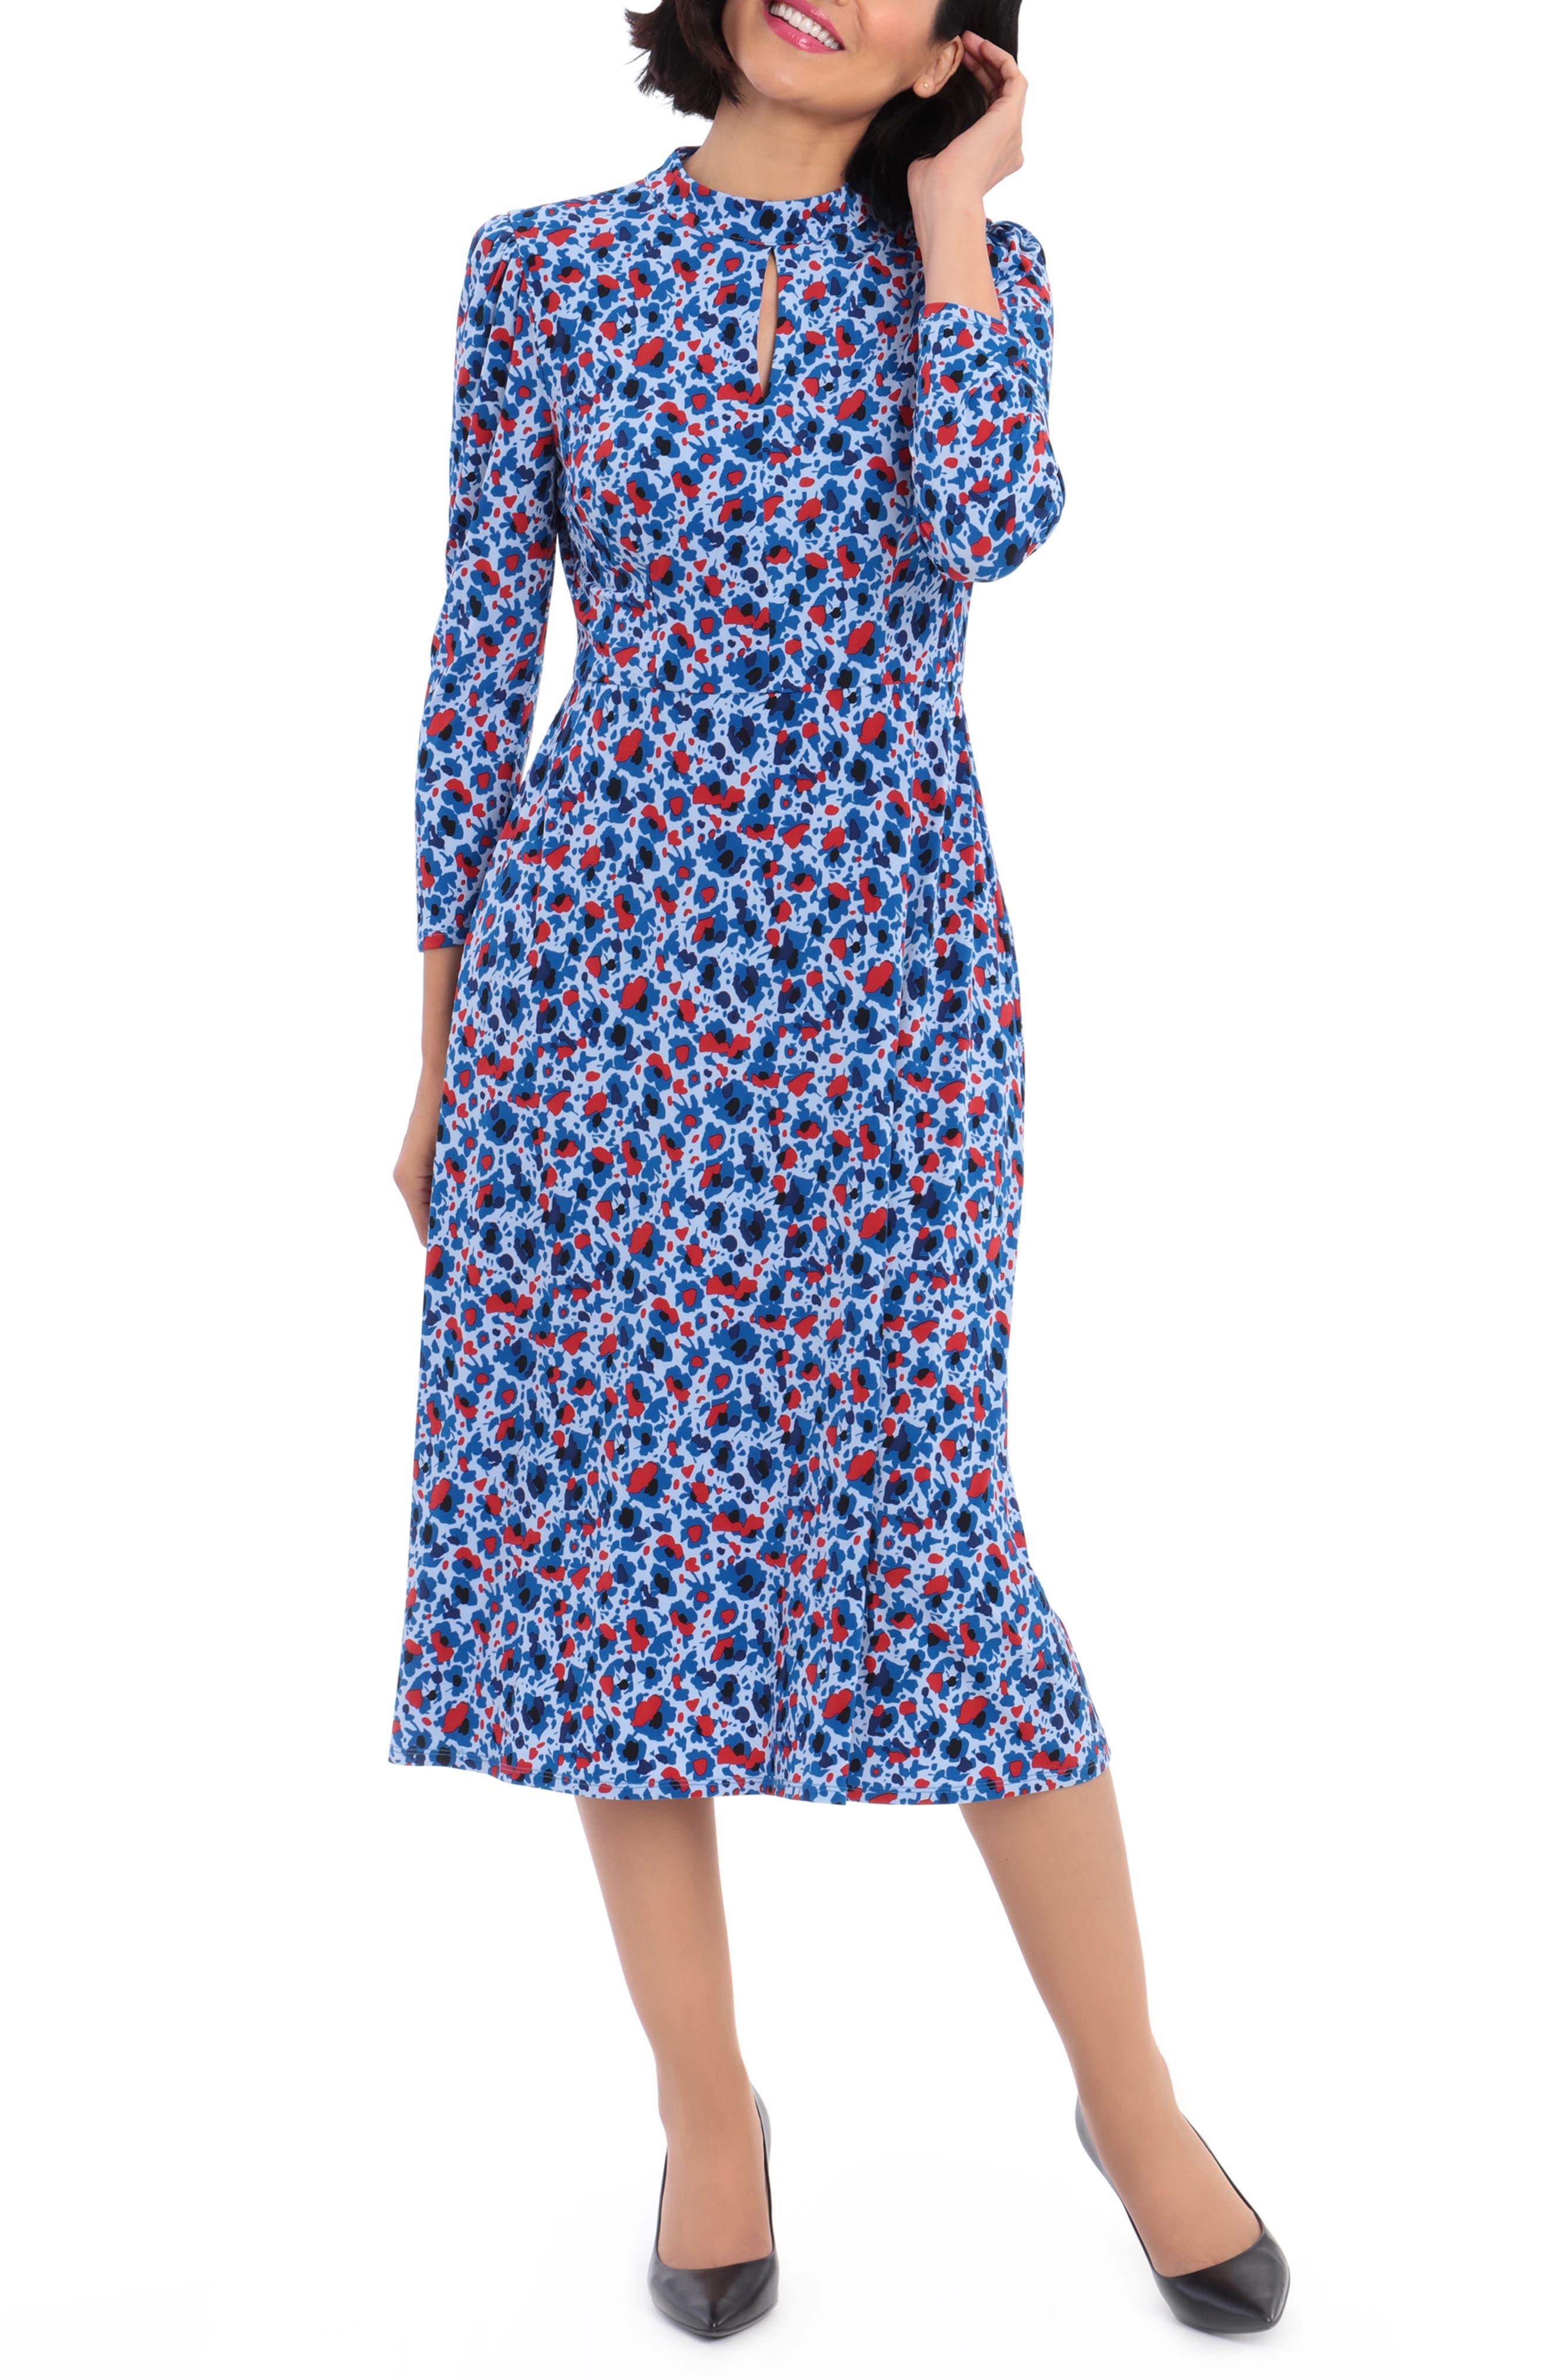 1930s Dresses | 30s Art Deco Dress Womens Maggy London Ditsy Midi Dress Size 6 - Blue $128.00 AT vintagedancer.com